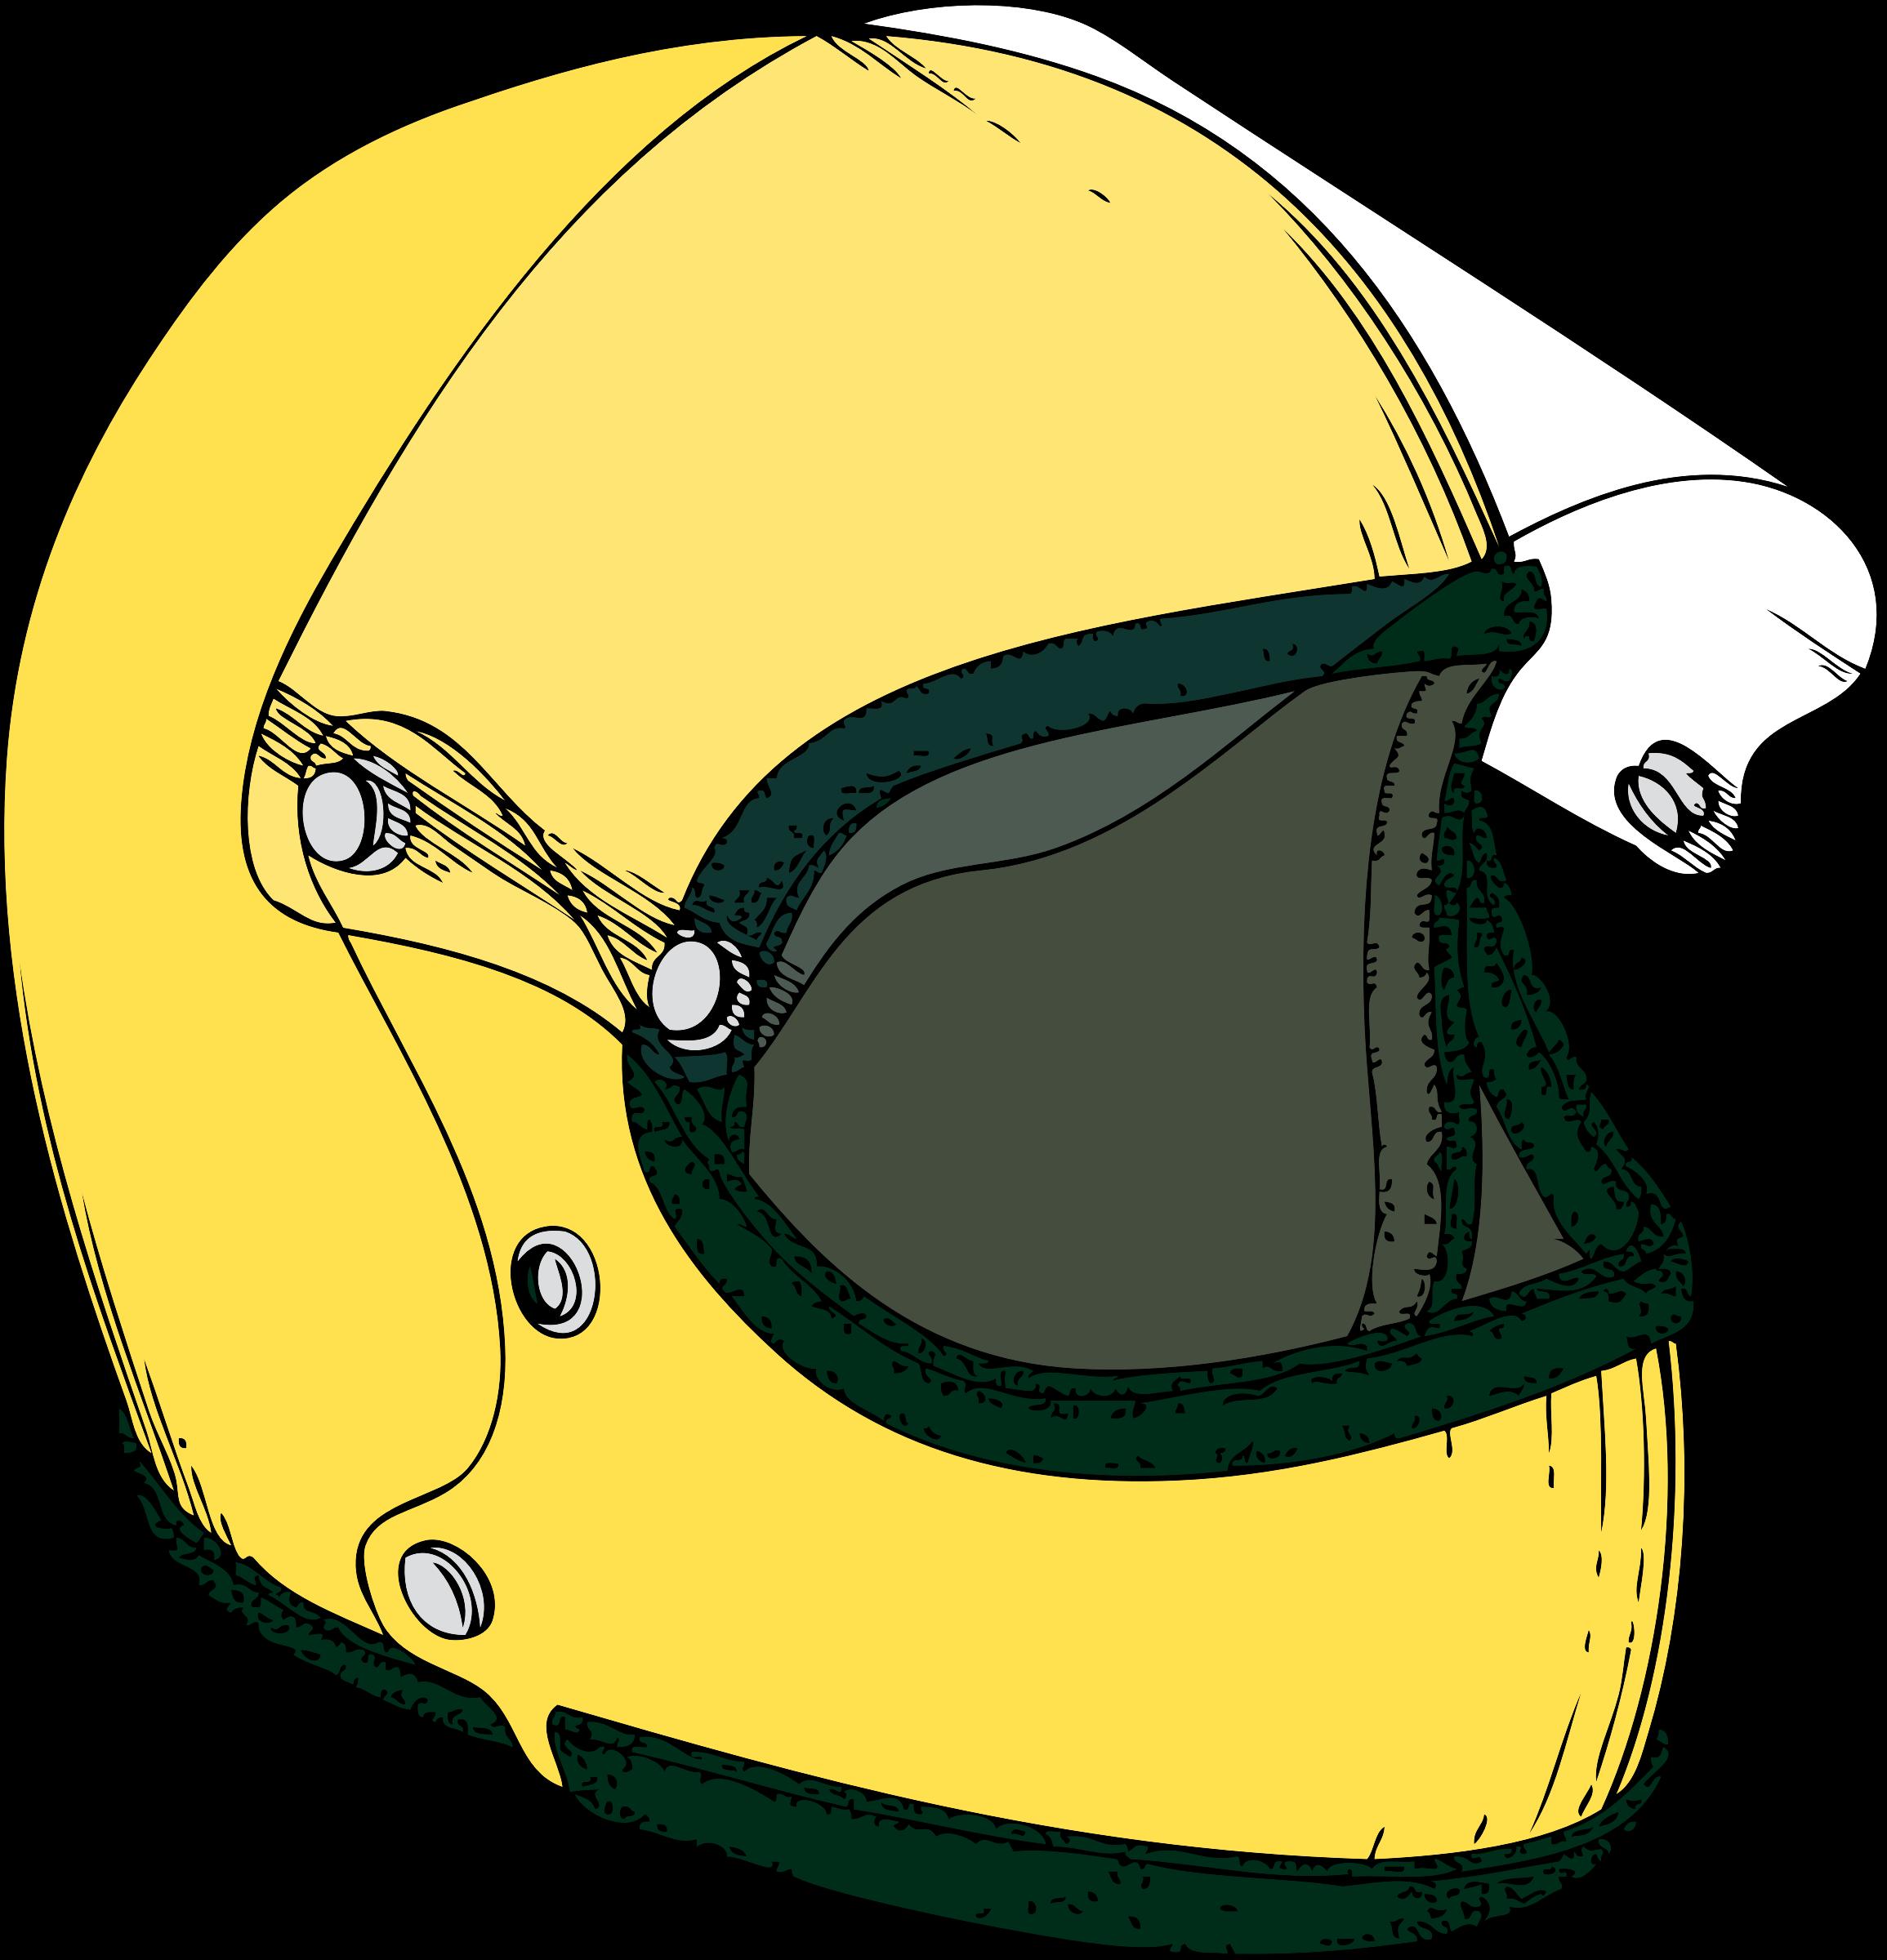 Motorcycle Crash Helmet Vector Clipart image - Free stock ...